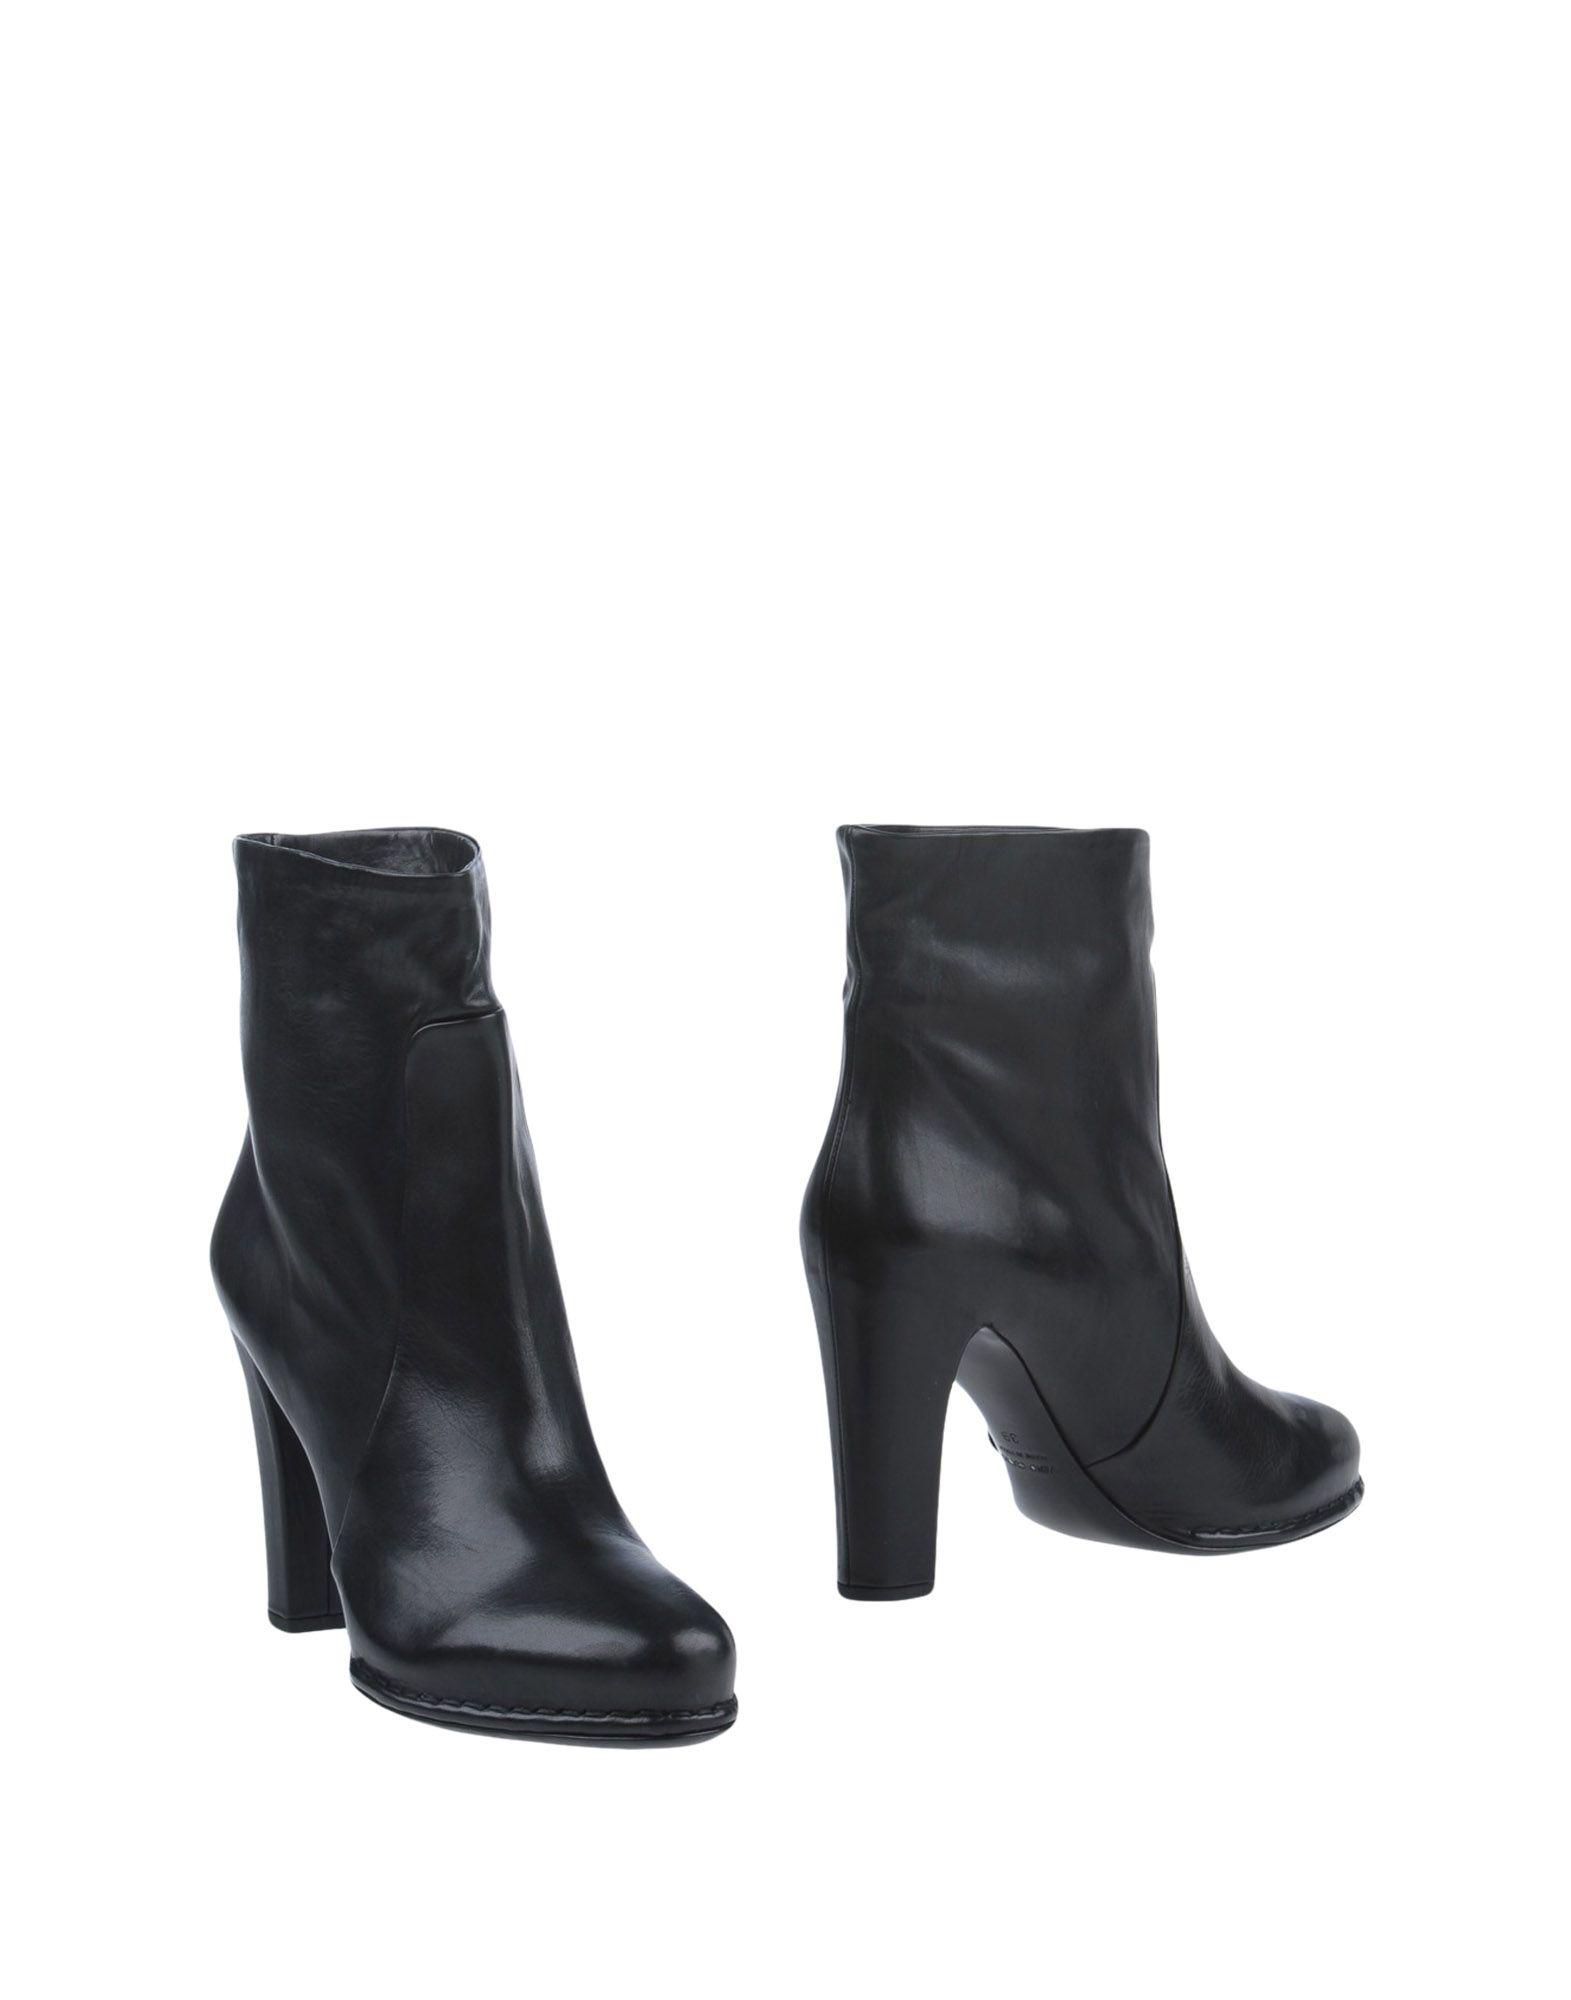 ROBERTO DEL CARLO Полусапоги и высокие ботинки magazzini del sale полусапоги и высокие ботинки